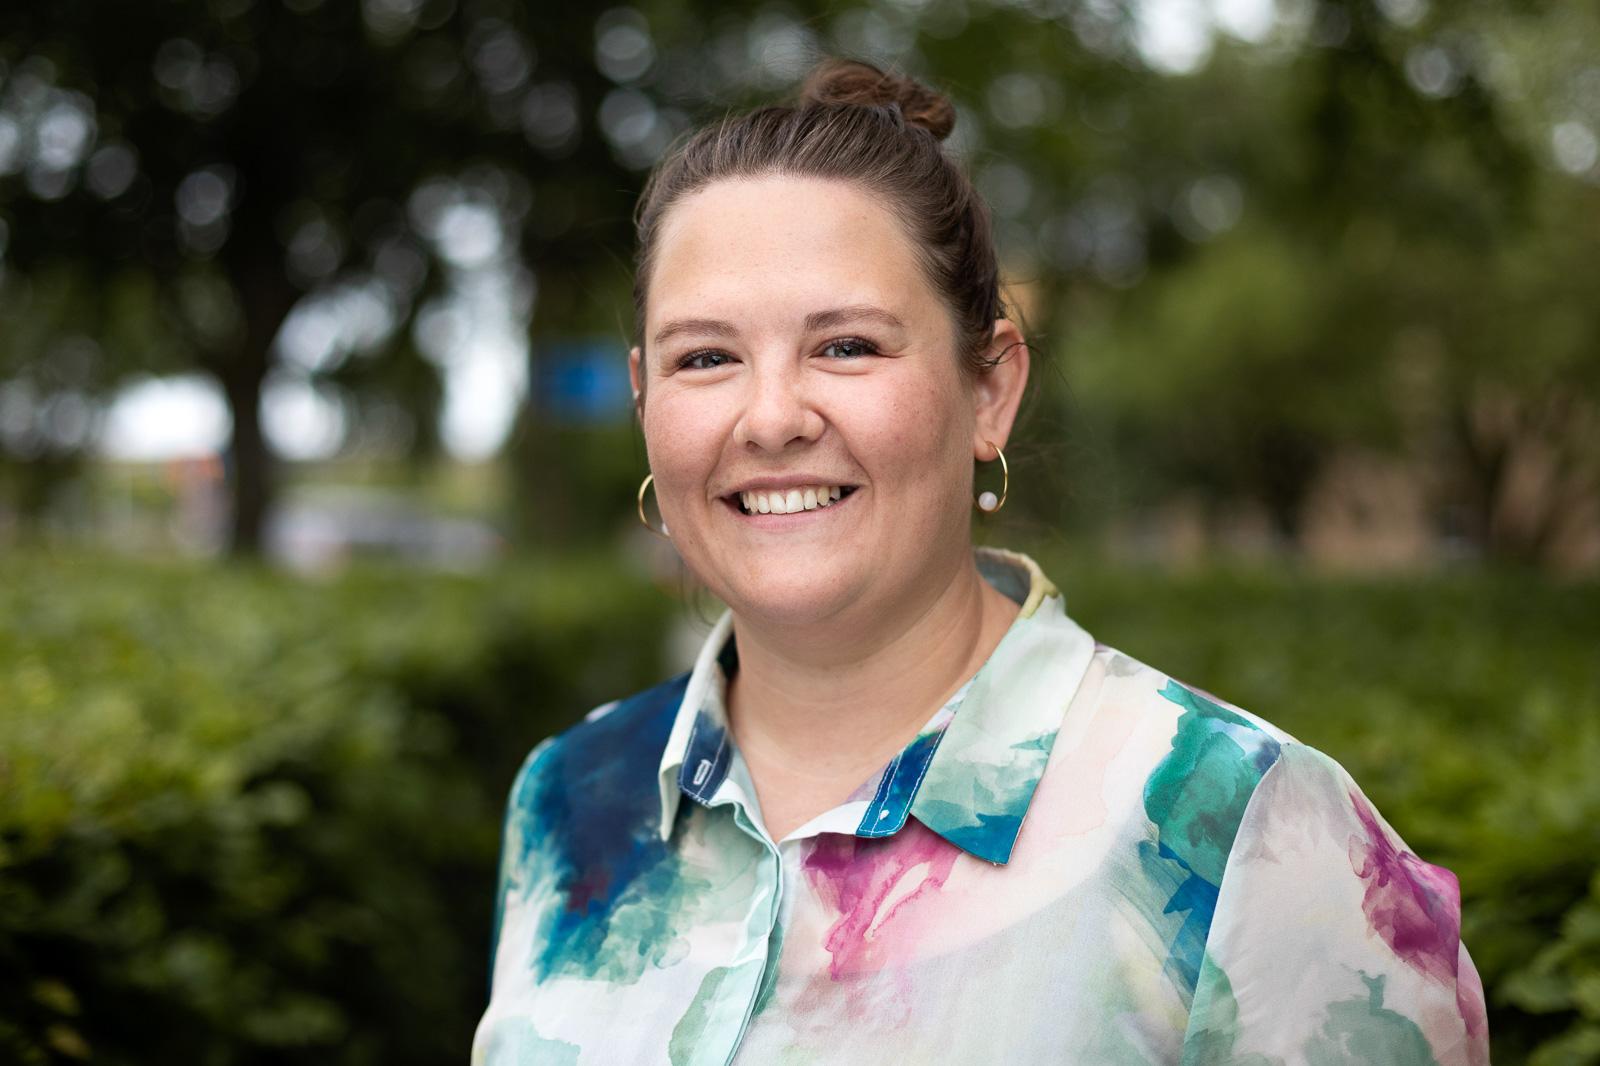 Laura Munk Petersen